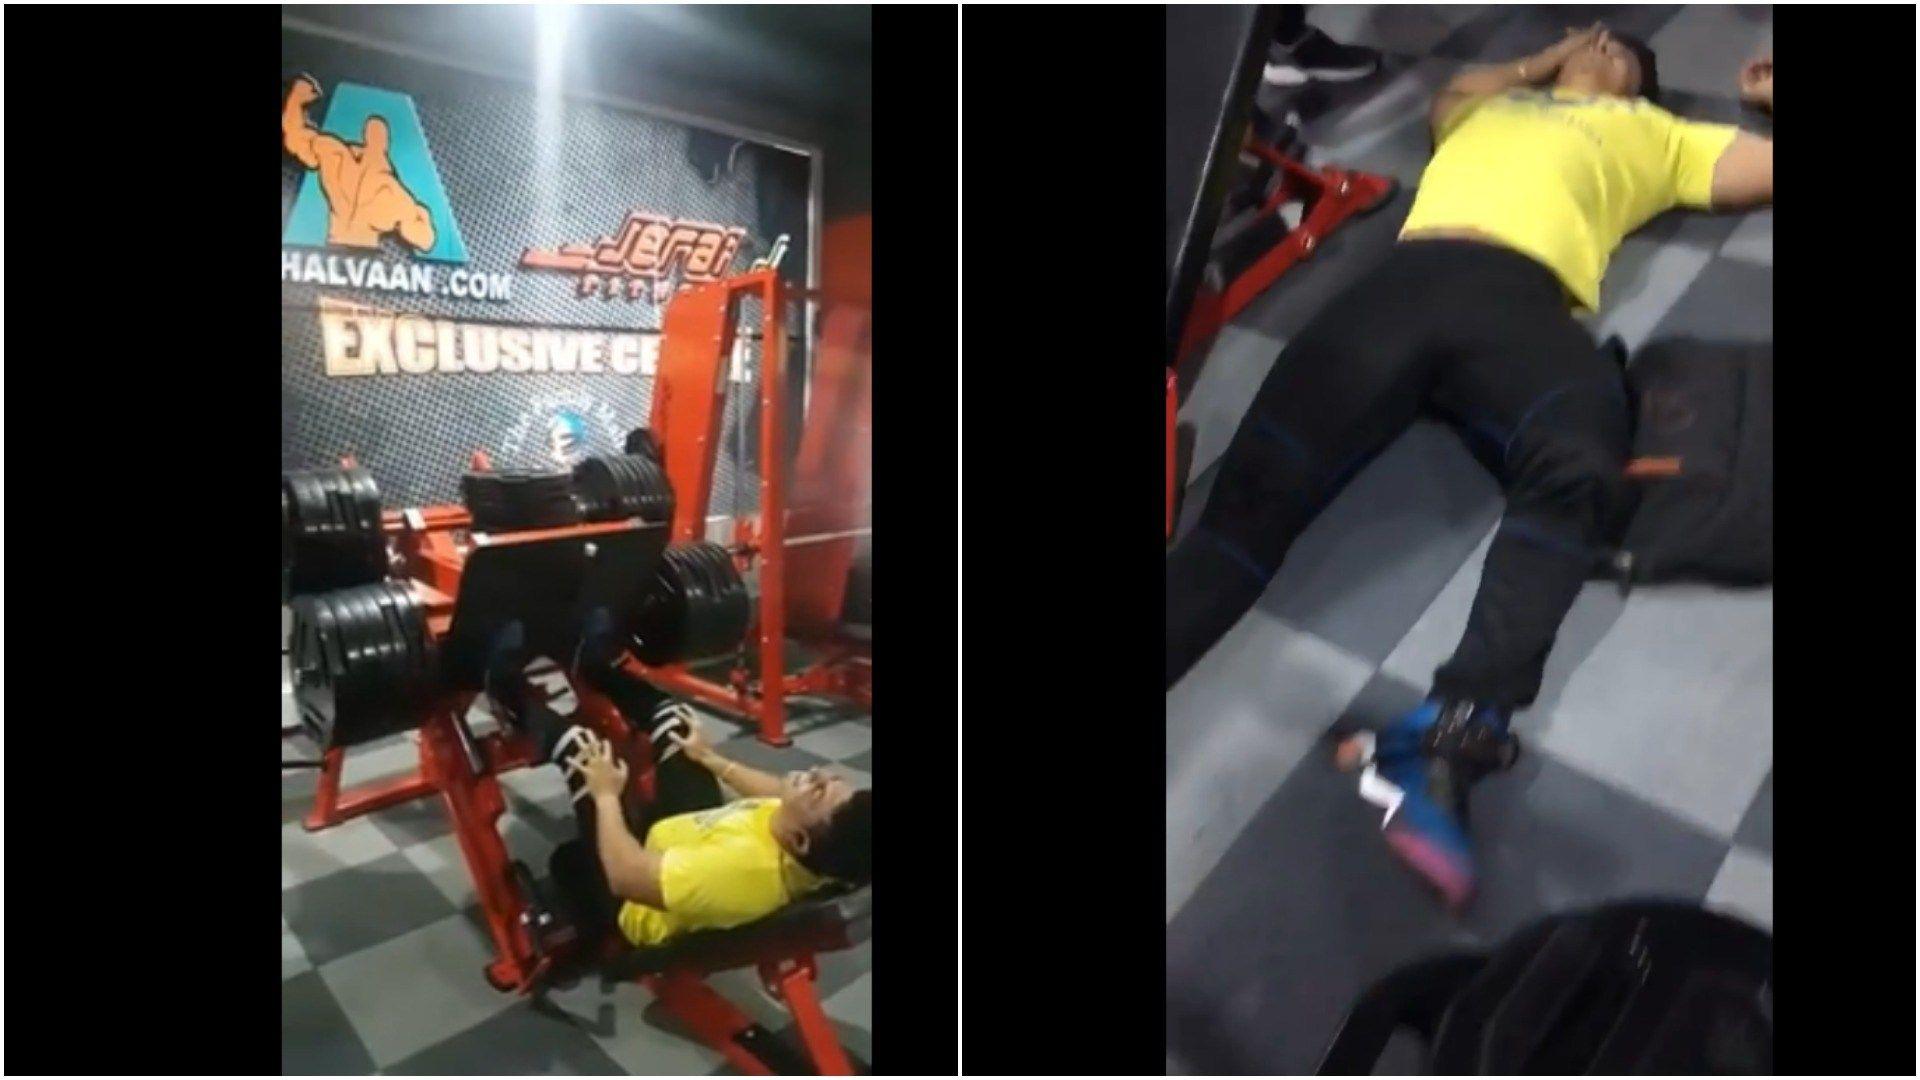 GRAPHIC Guy Breaks Leg On Leg Machine Leg machines